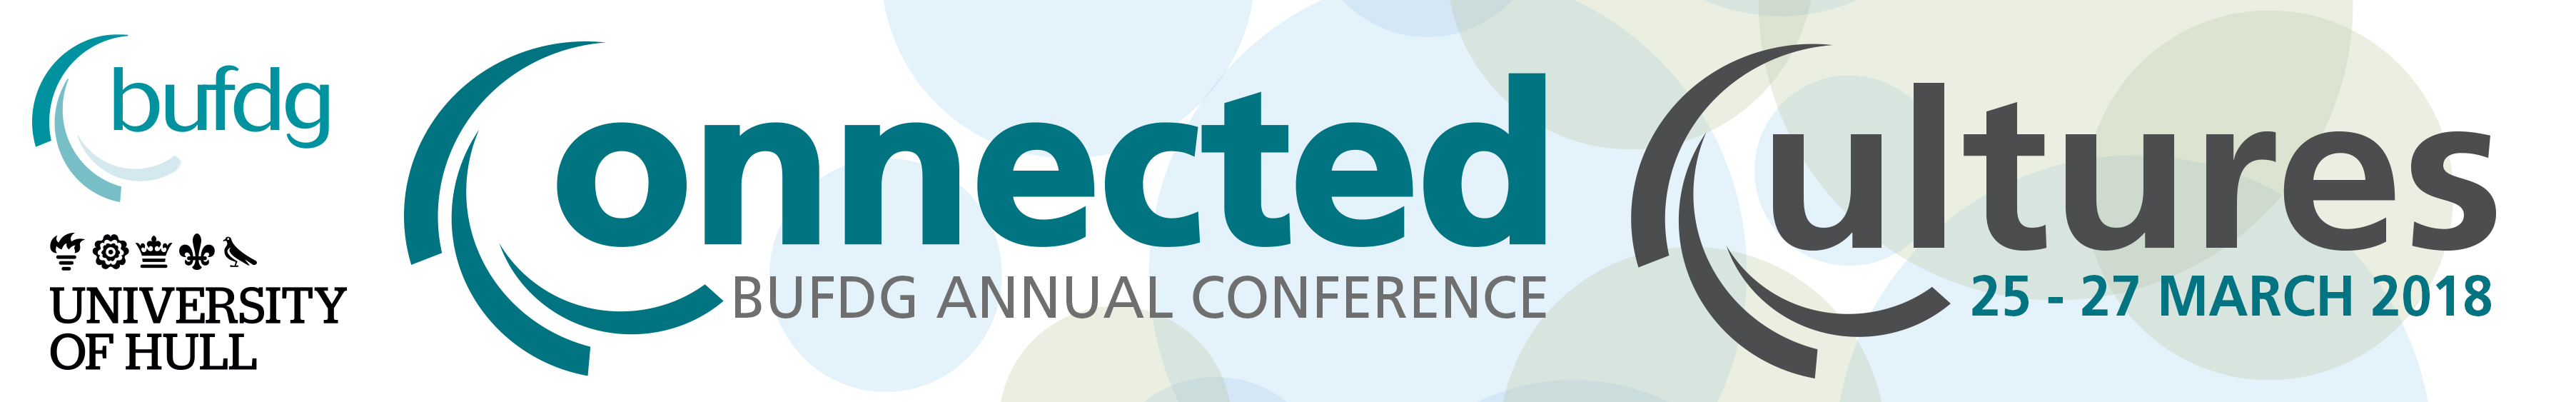 BUFDG 2018 Annual Conference - Sponsor Delegates